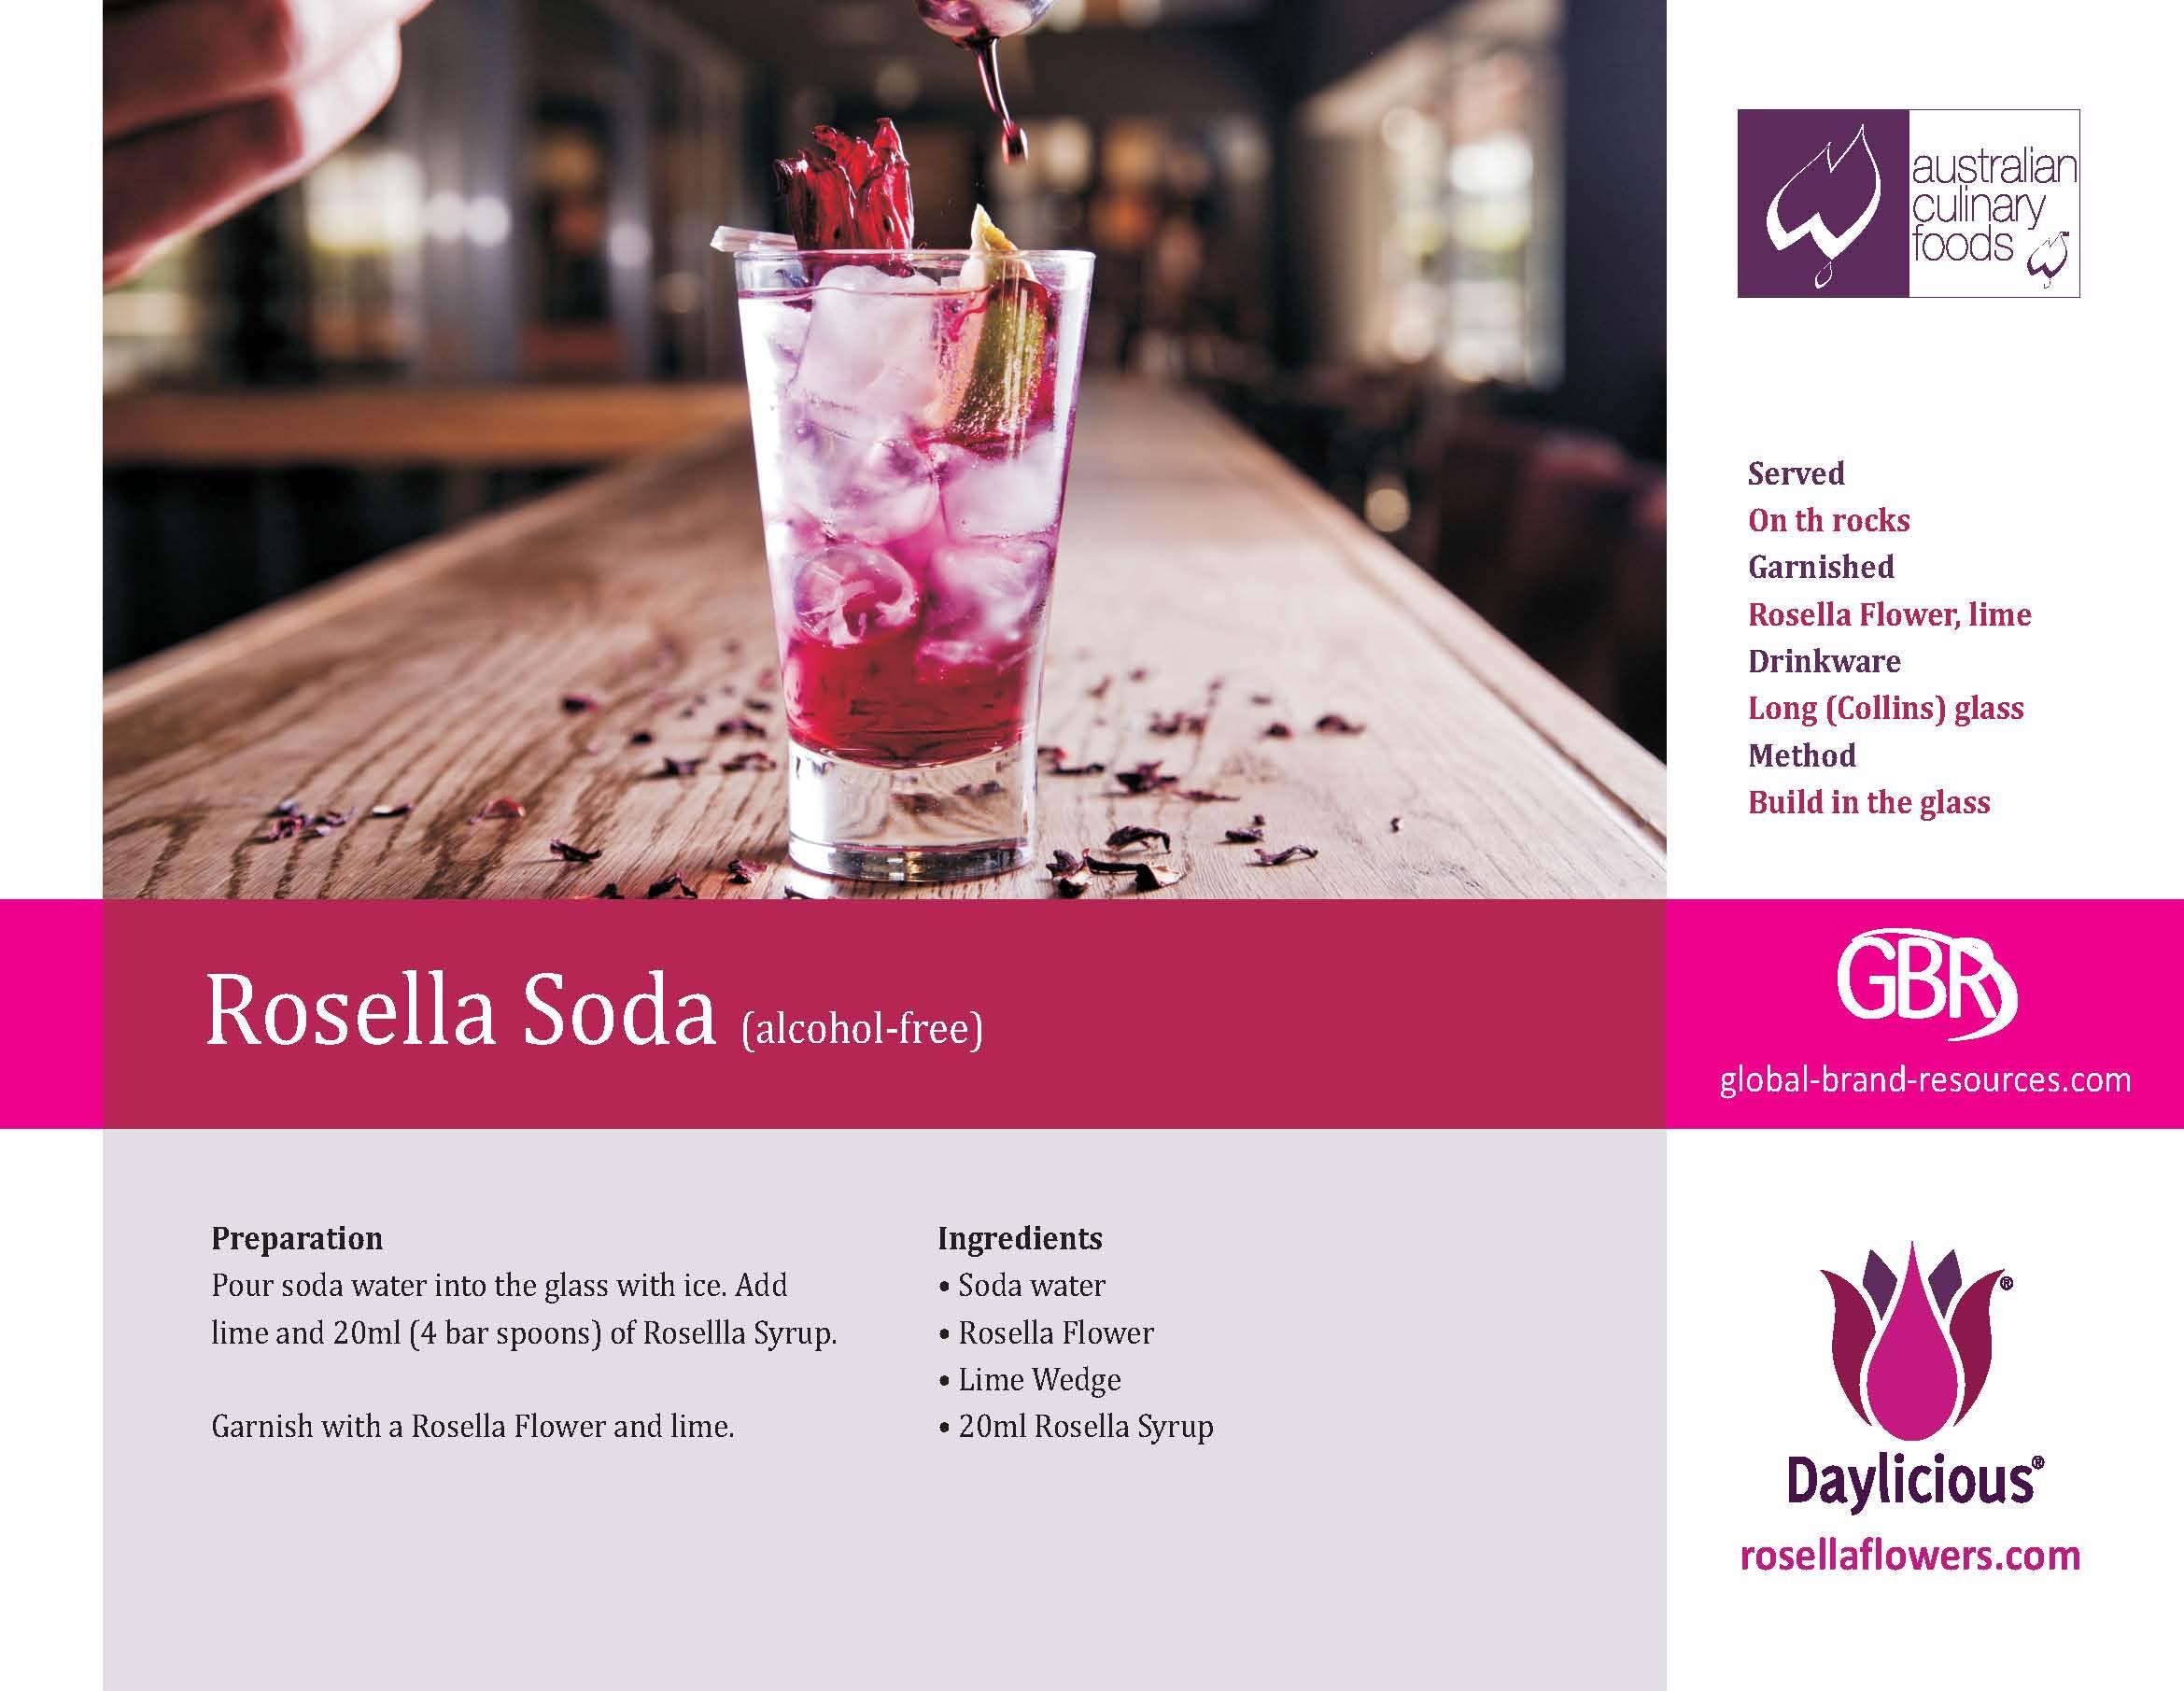 Rosella Soda